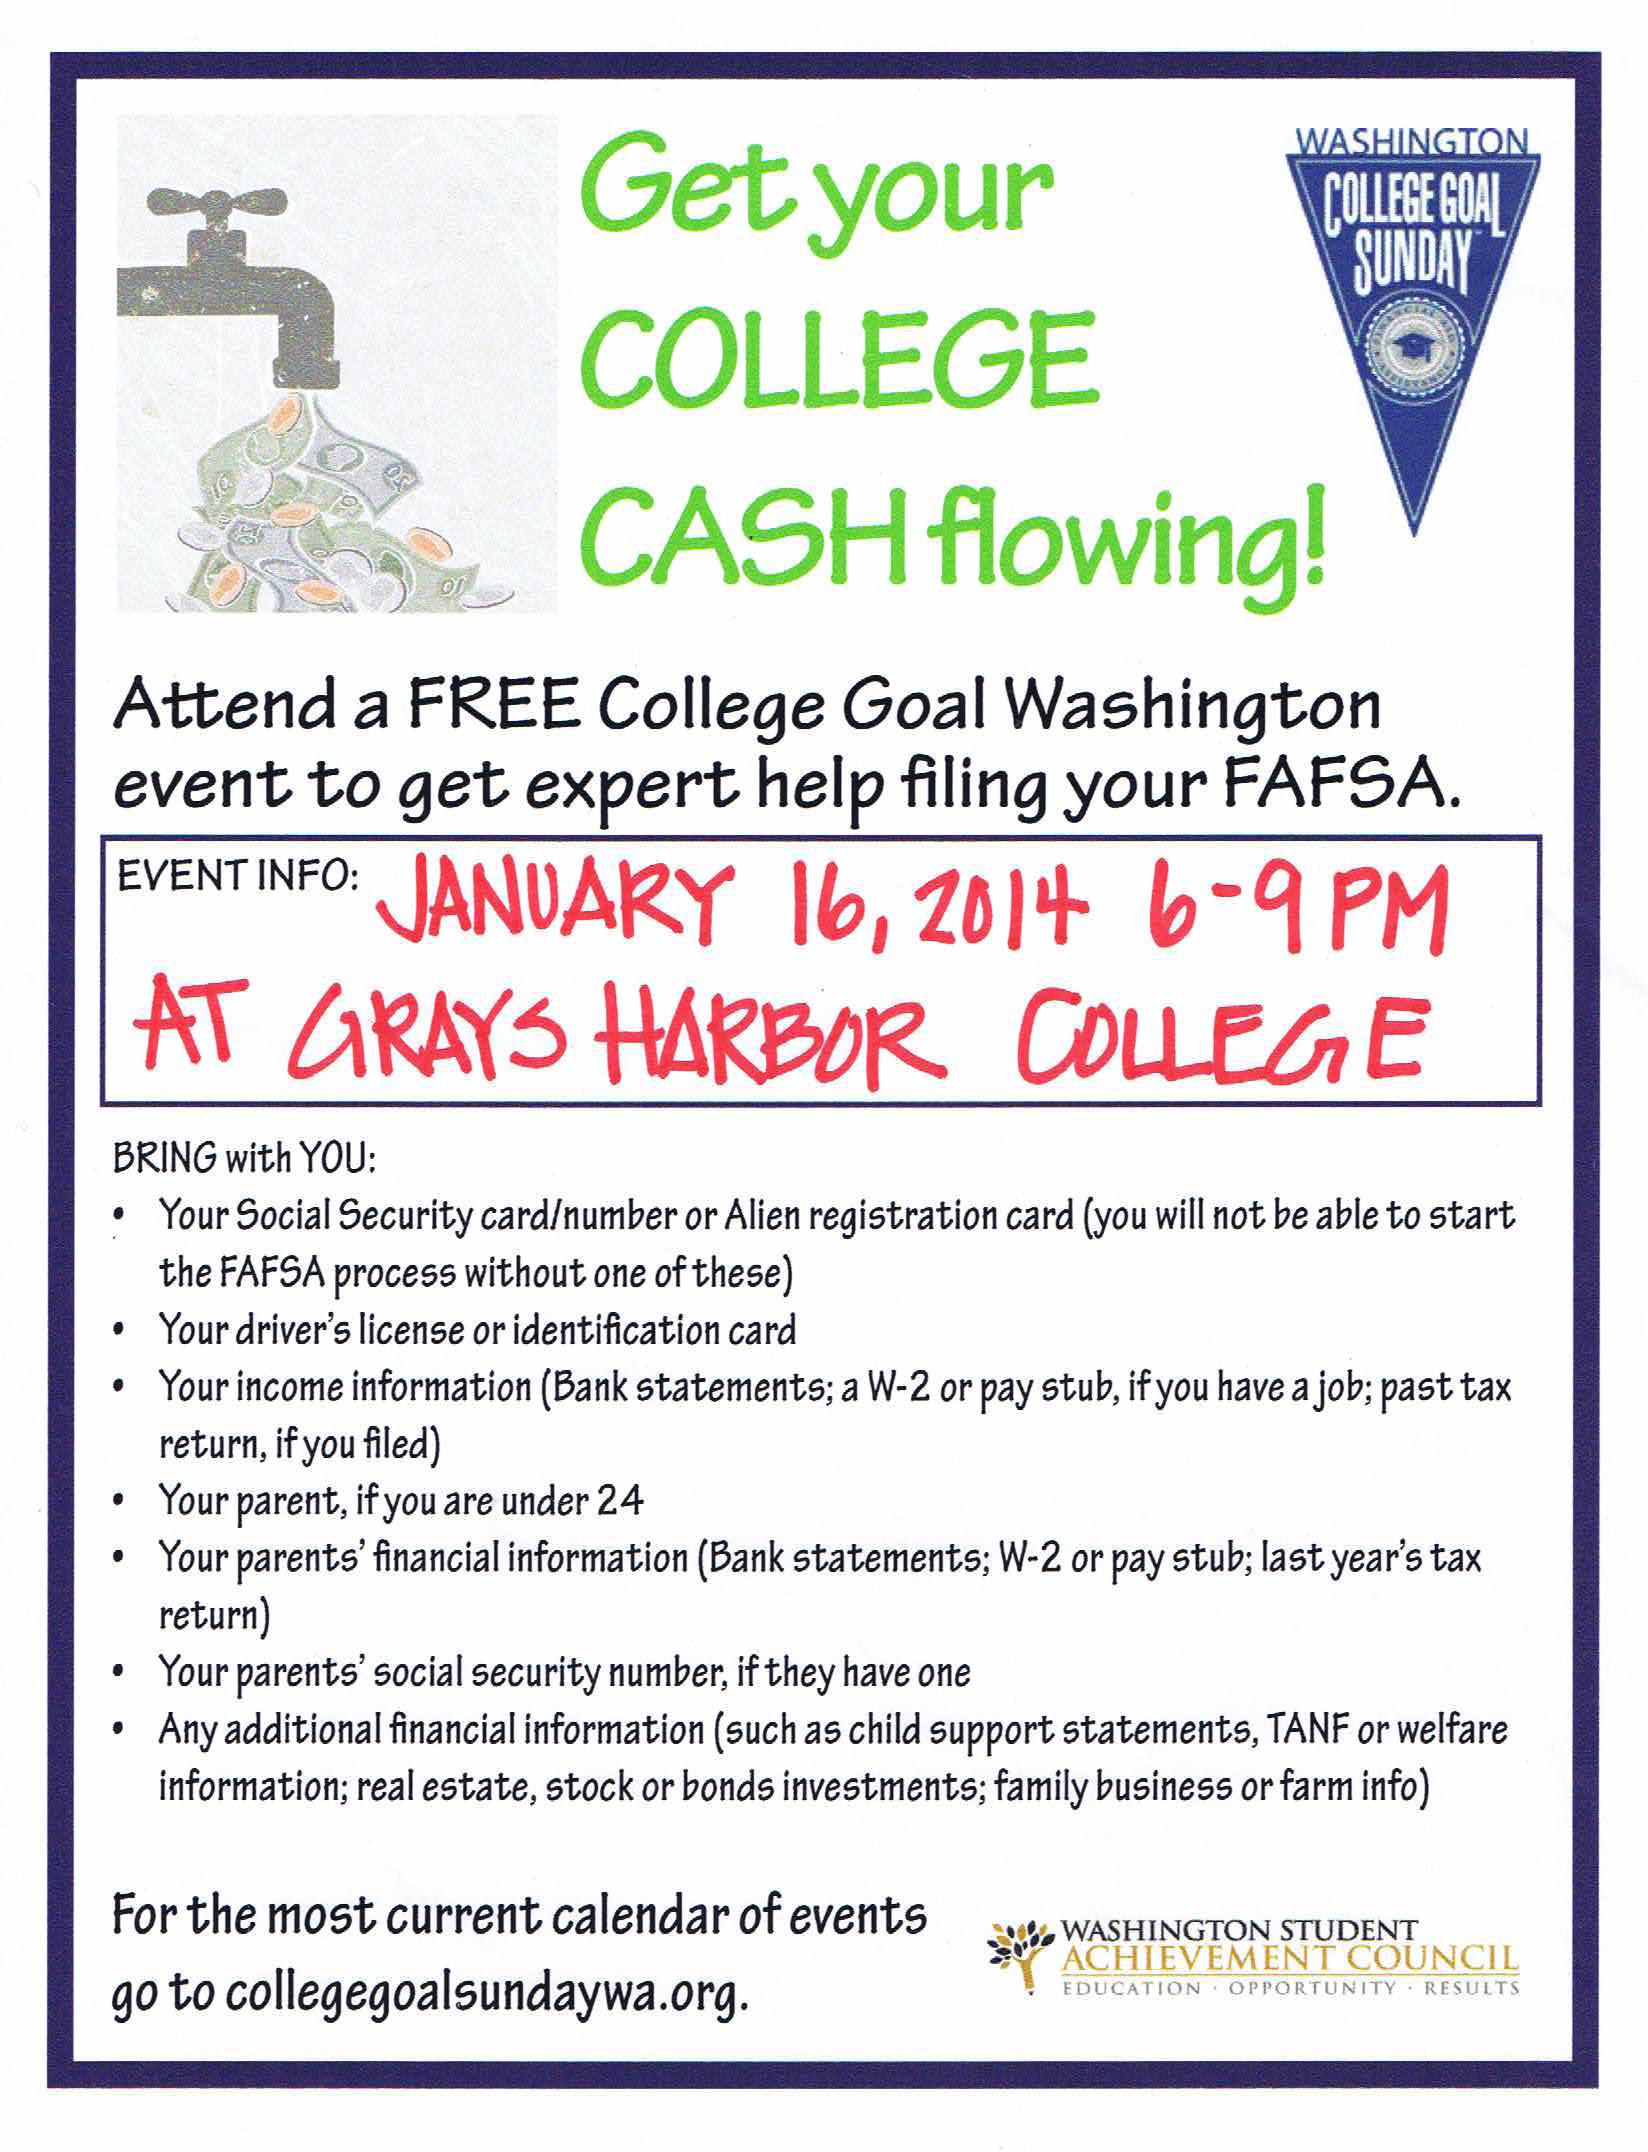 Grays Harbor College to hold free FAFSA event | KXRO News Radio